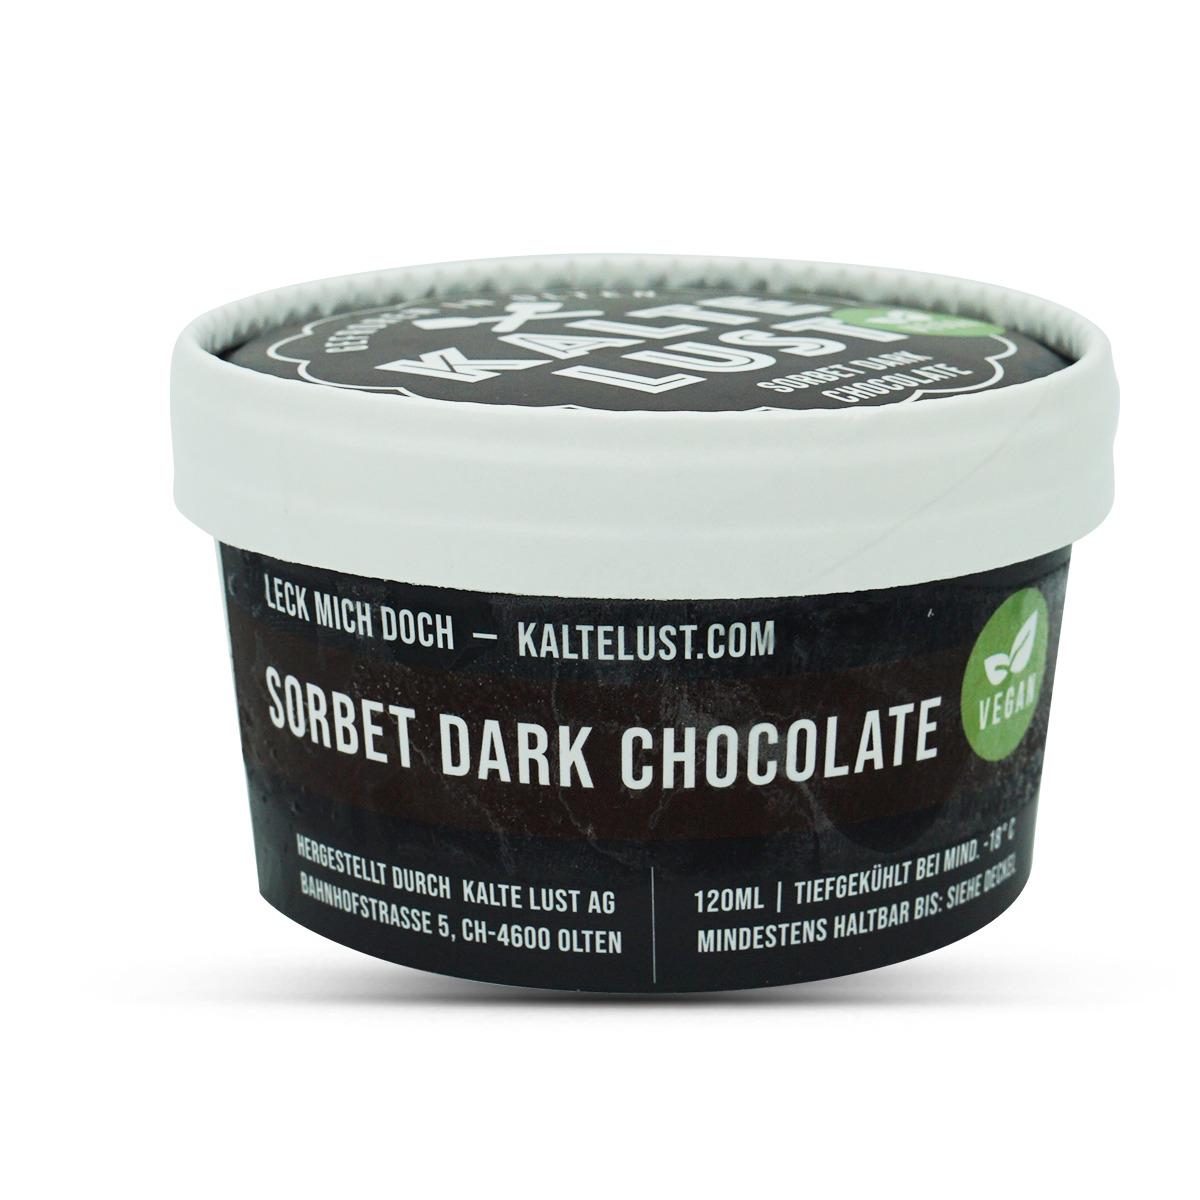 Kalte Lust Sorbet Dark Chocolate Vegan